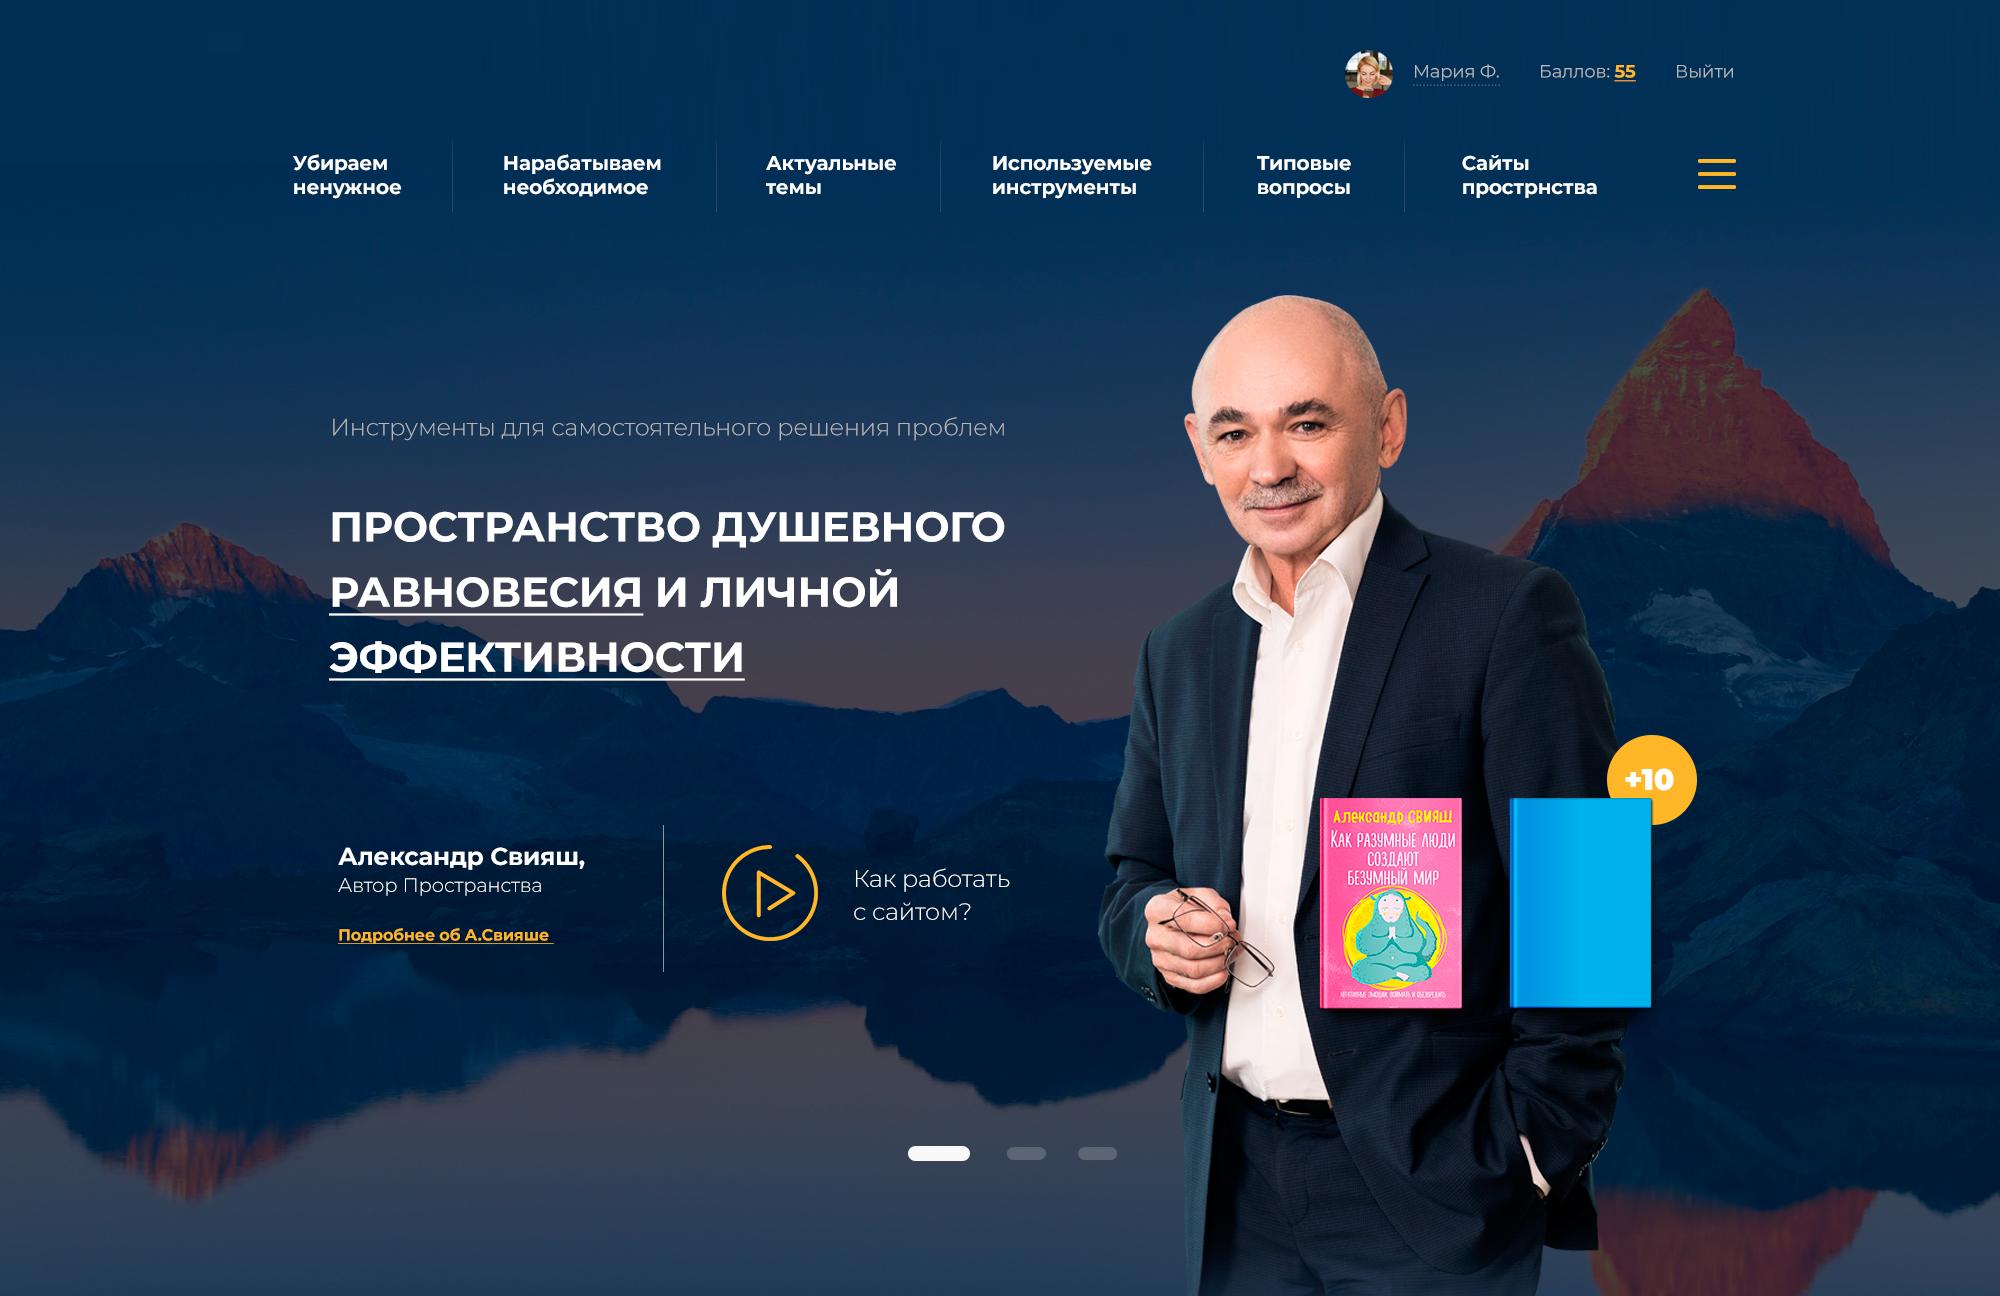 Участие в конкурсе на разработку концепции сайта Александра Свияш